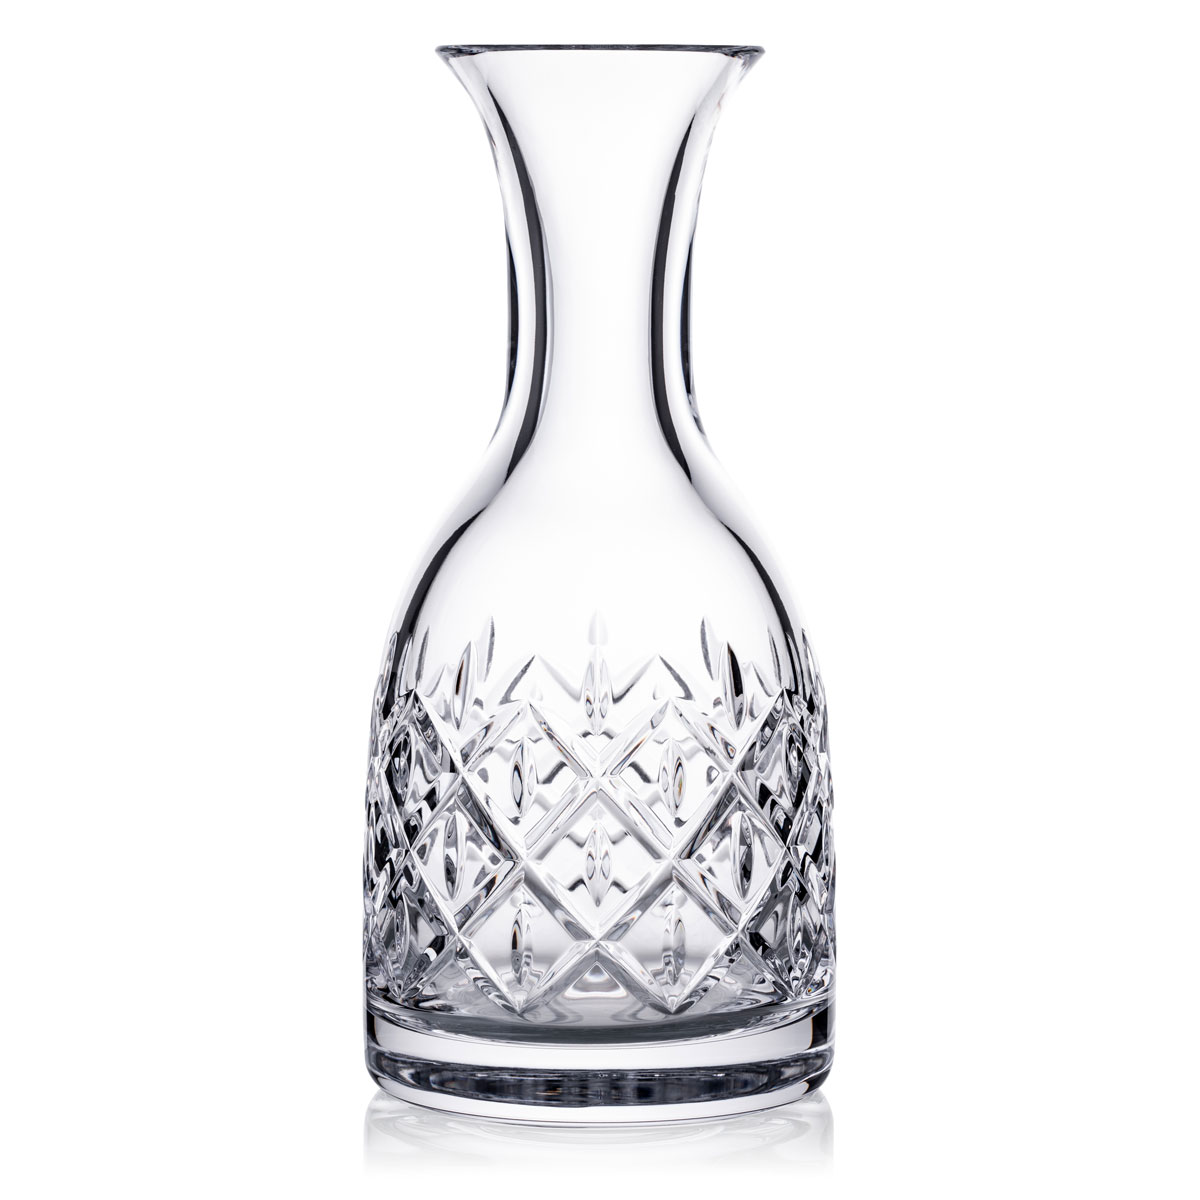 Waterford Crystal Astor Wine Carafe